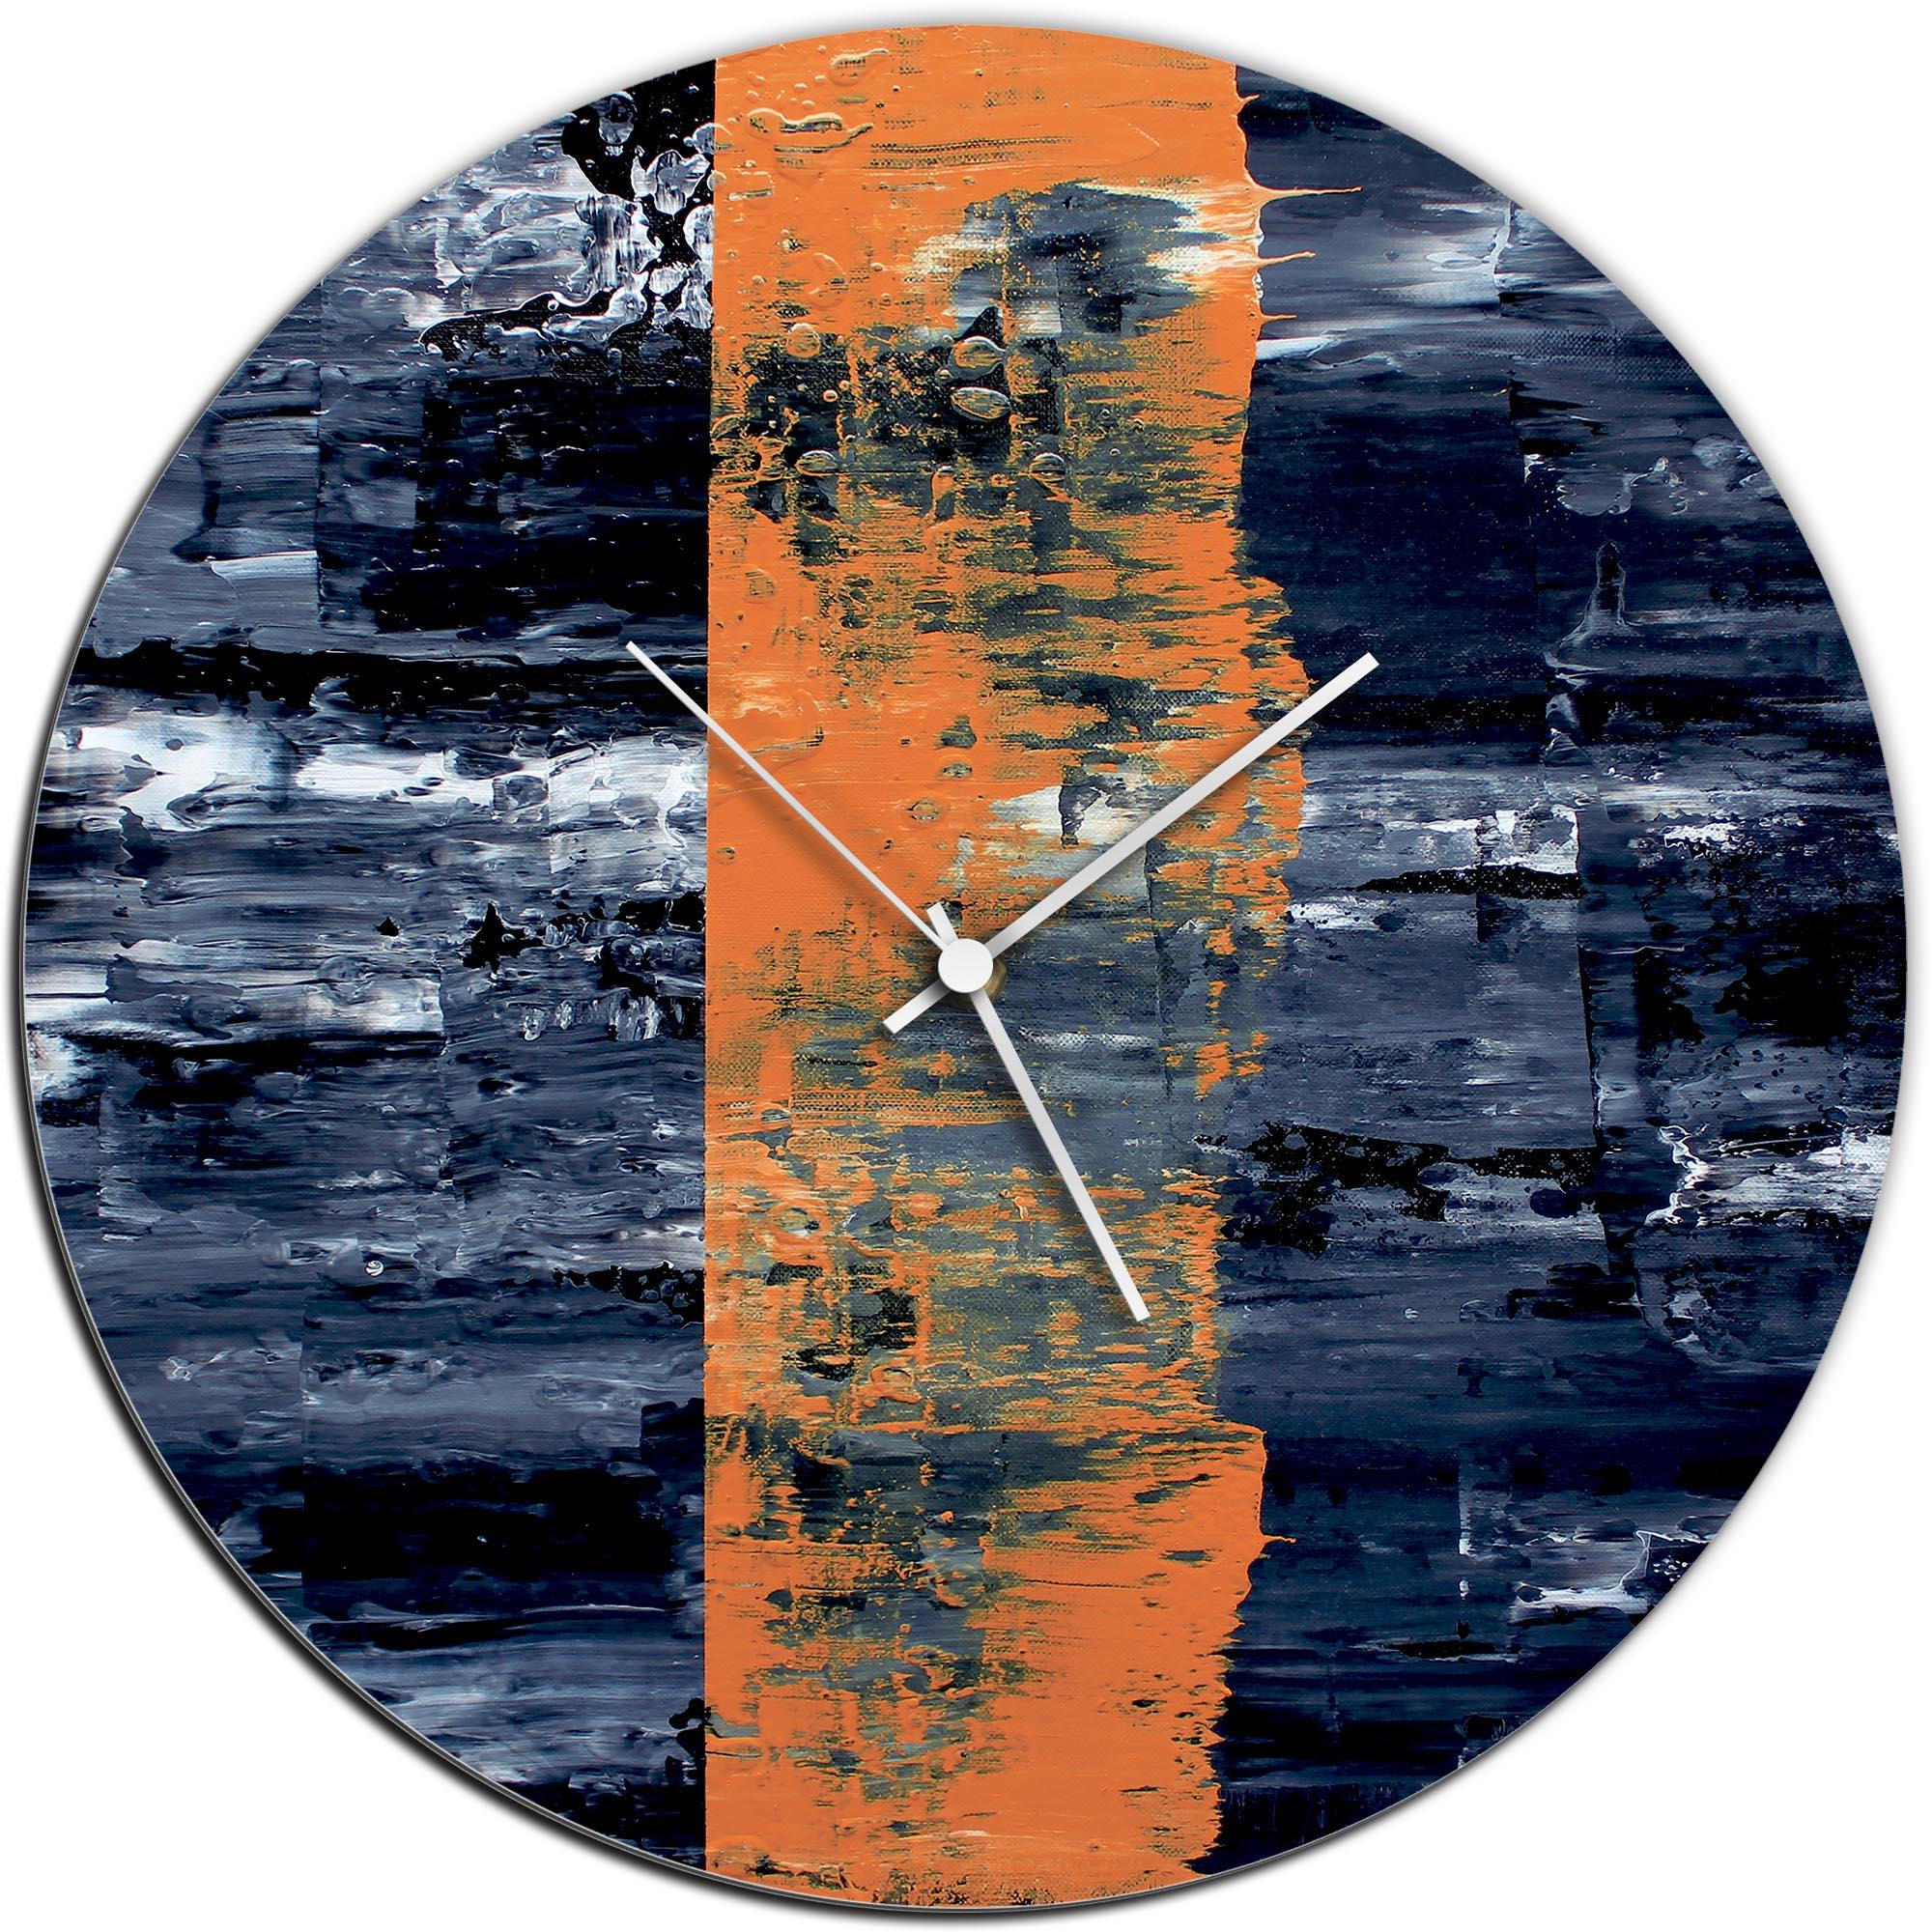 Mendo Vasilevski 'Orange Line Circle Clock Large' 22in x 22in Modern Wall Clock on Aluminum Composite